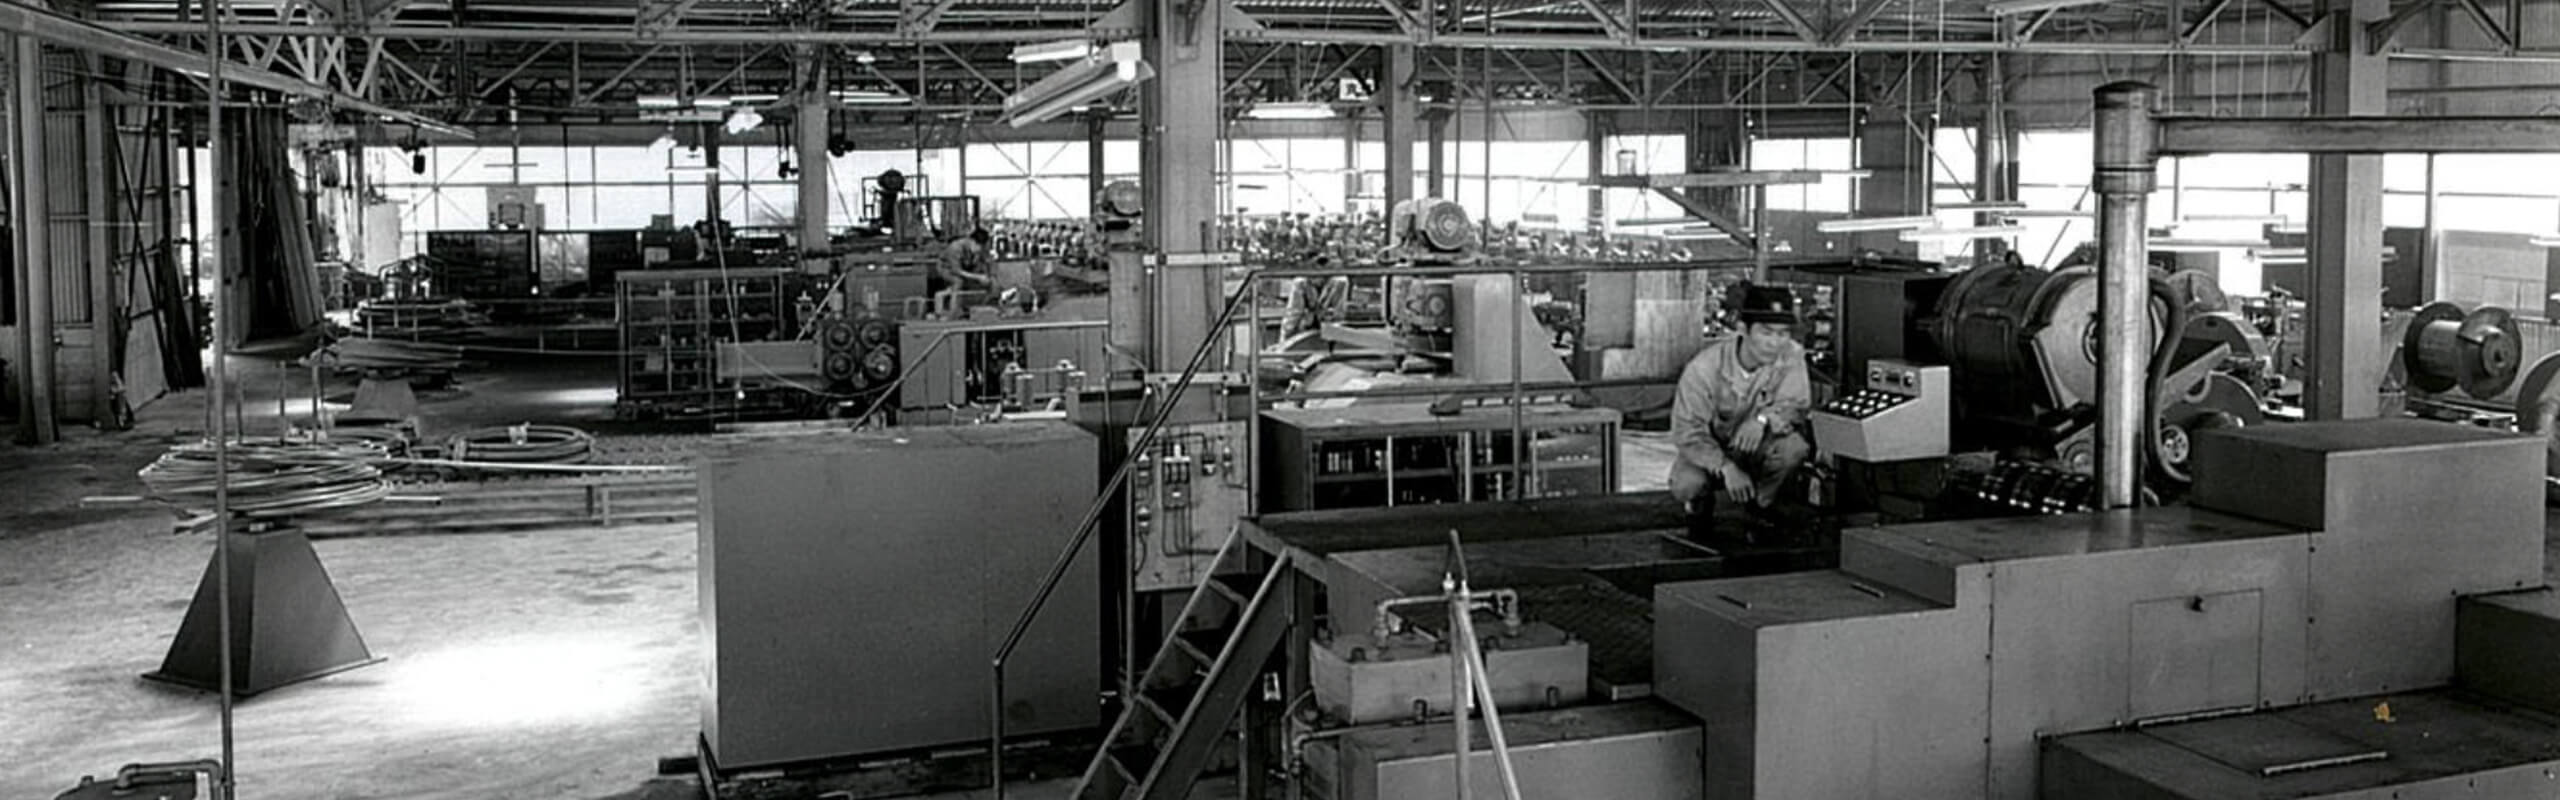 杉浦製作所の沿革